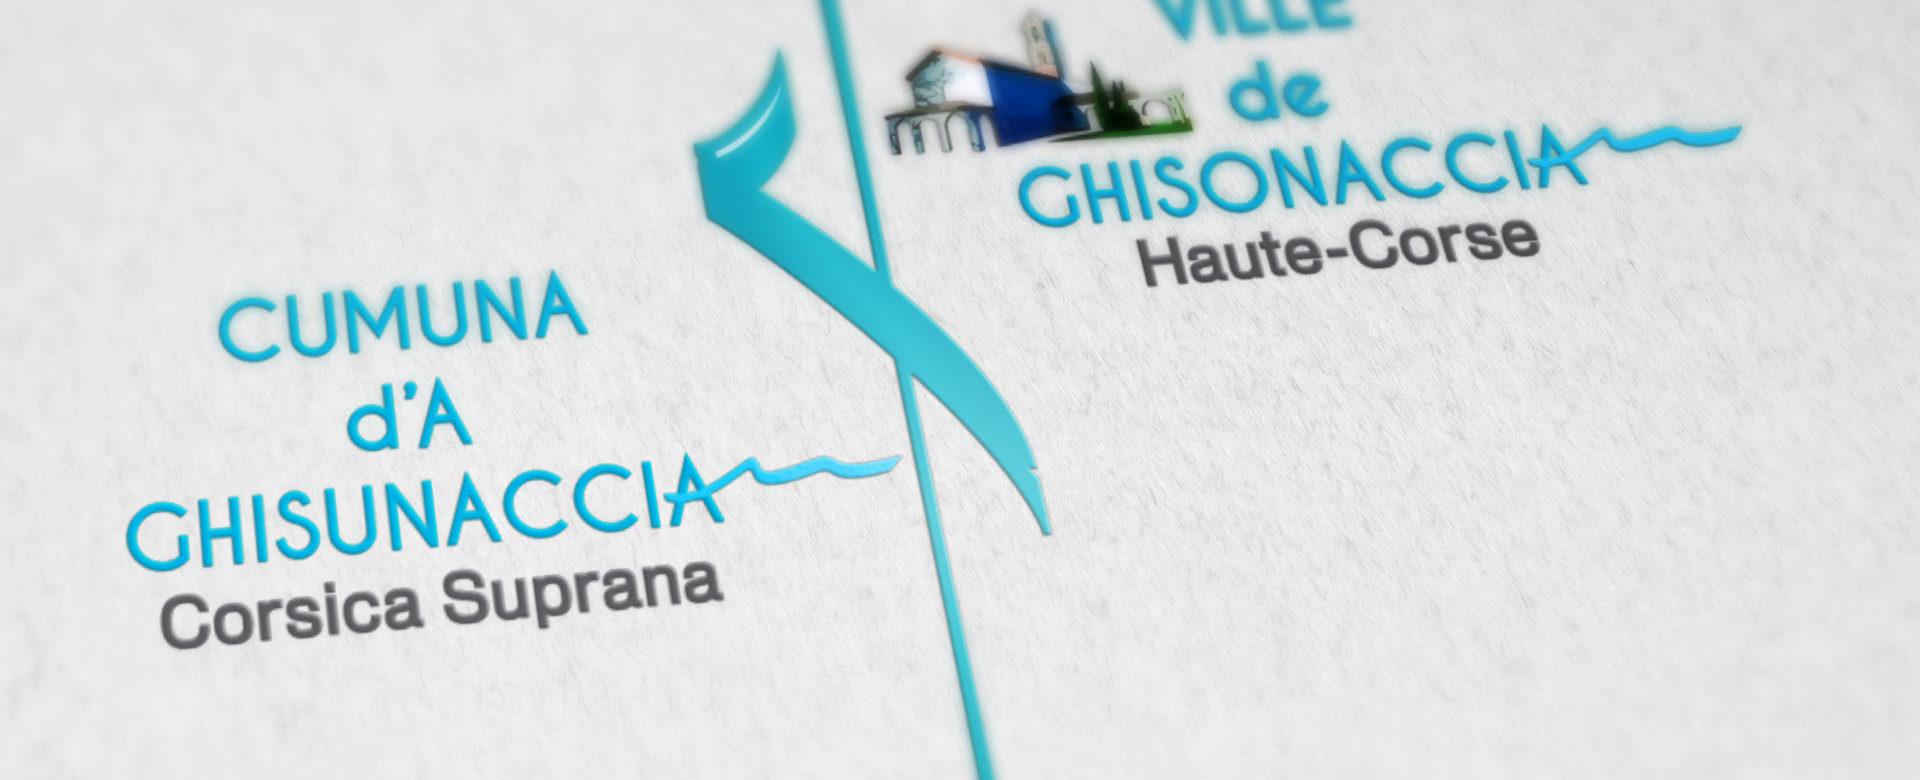 mairie-ghisonaccia-logo-corse